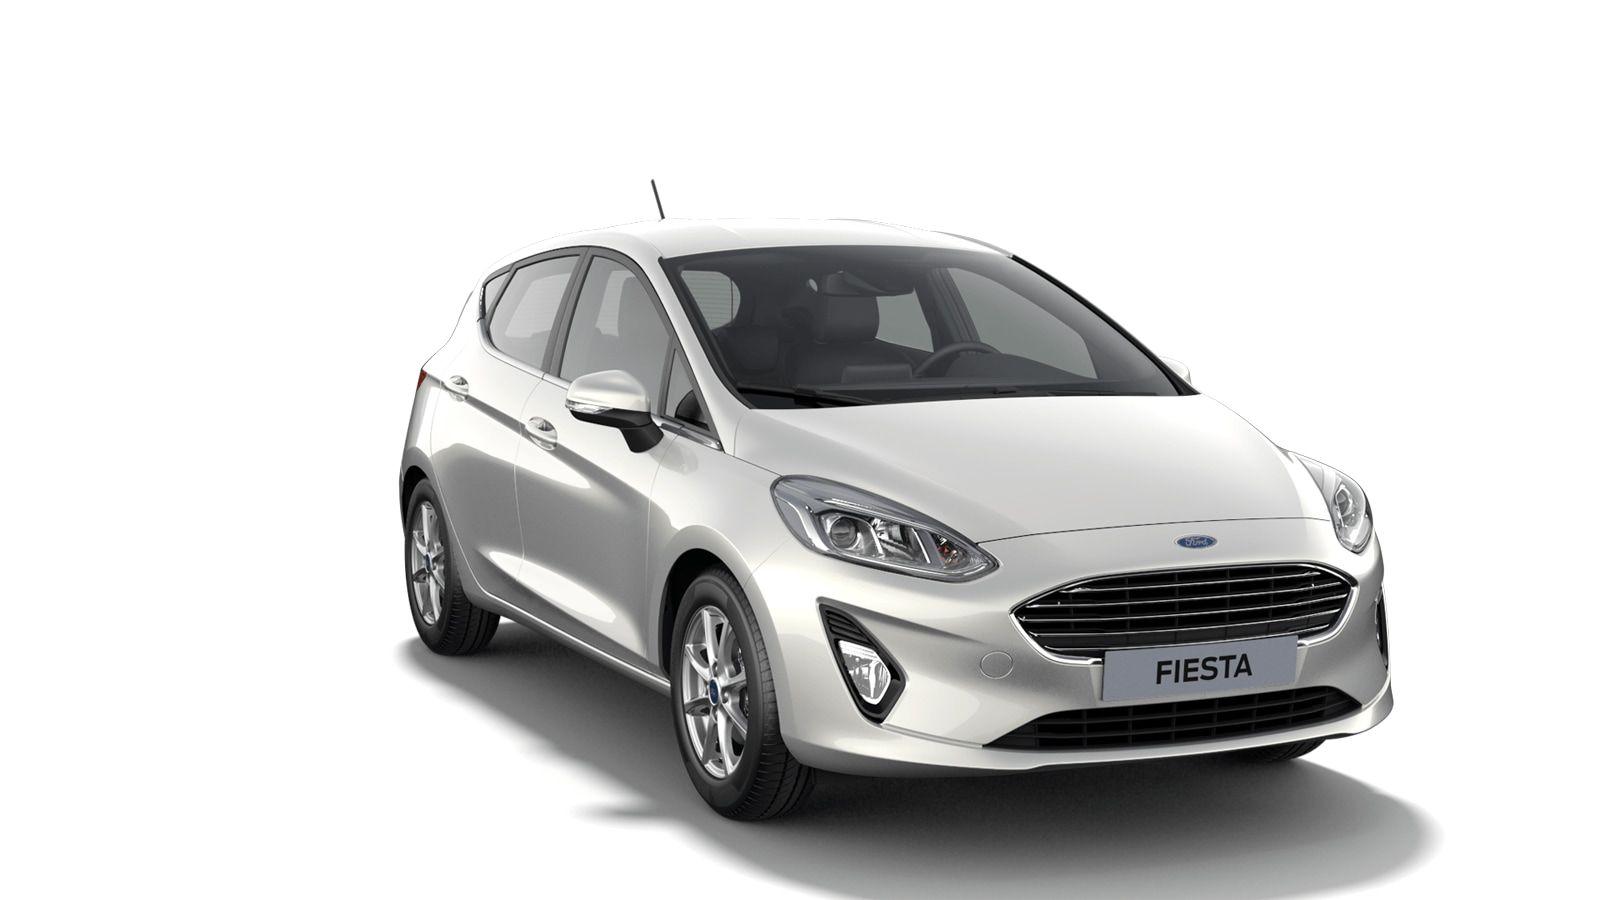 "Nieuw Ford All-new ford fiesta Connected 1.0i EcoBoost 95pk / 70kW M6 - 5d JKV - Speciale metaalkleur ""Metropolis White"" 3"